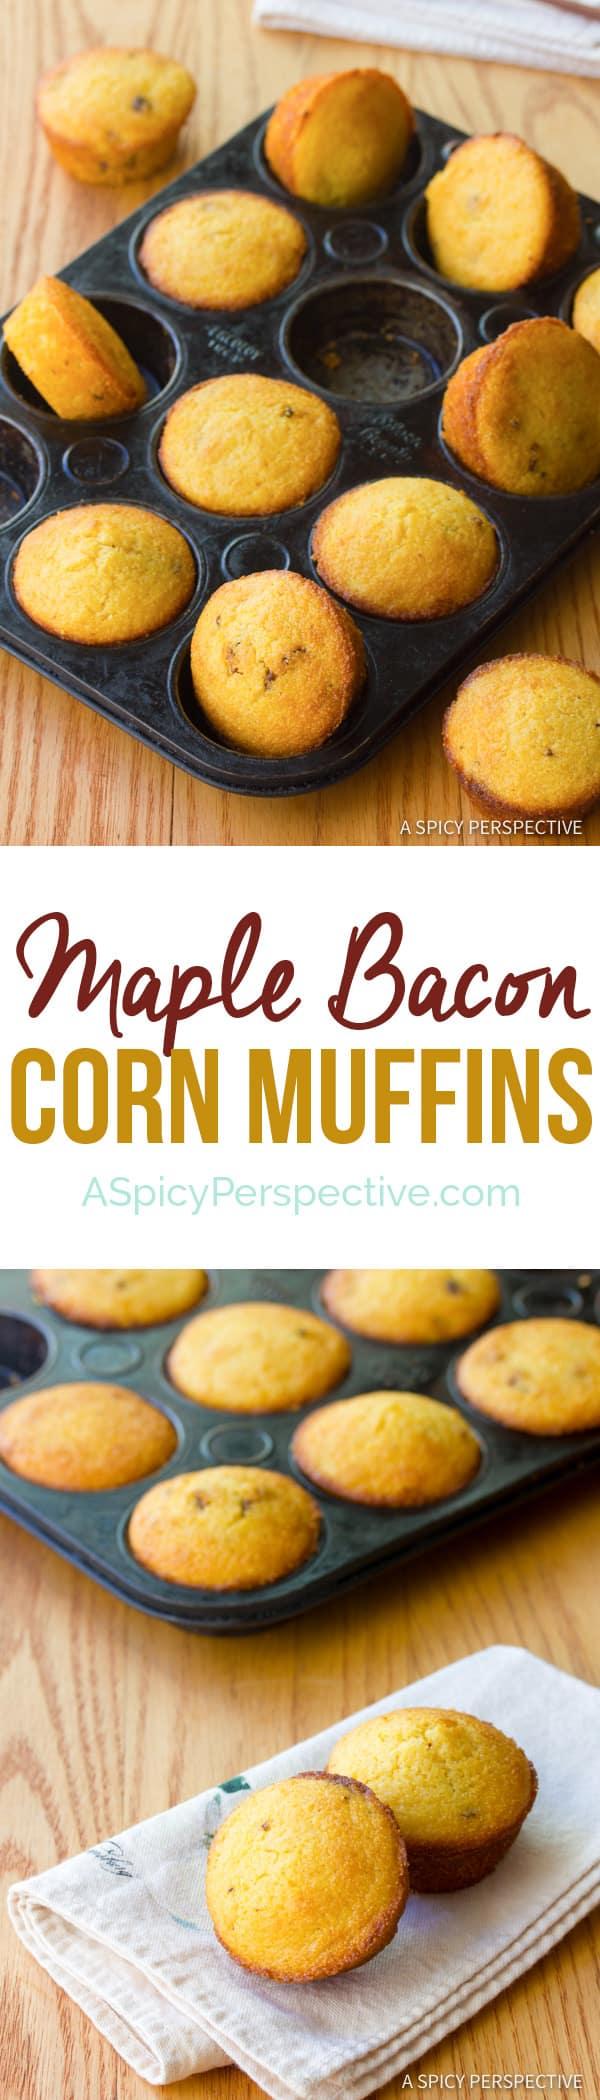 Maple Bacon Corn Muffins Recipe | ASpicyPerspective.com